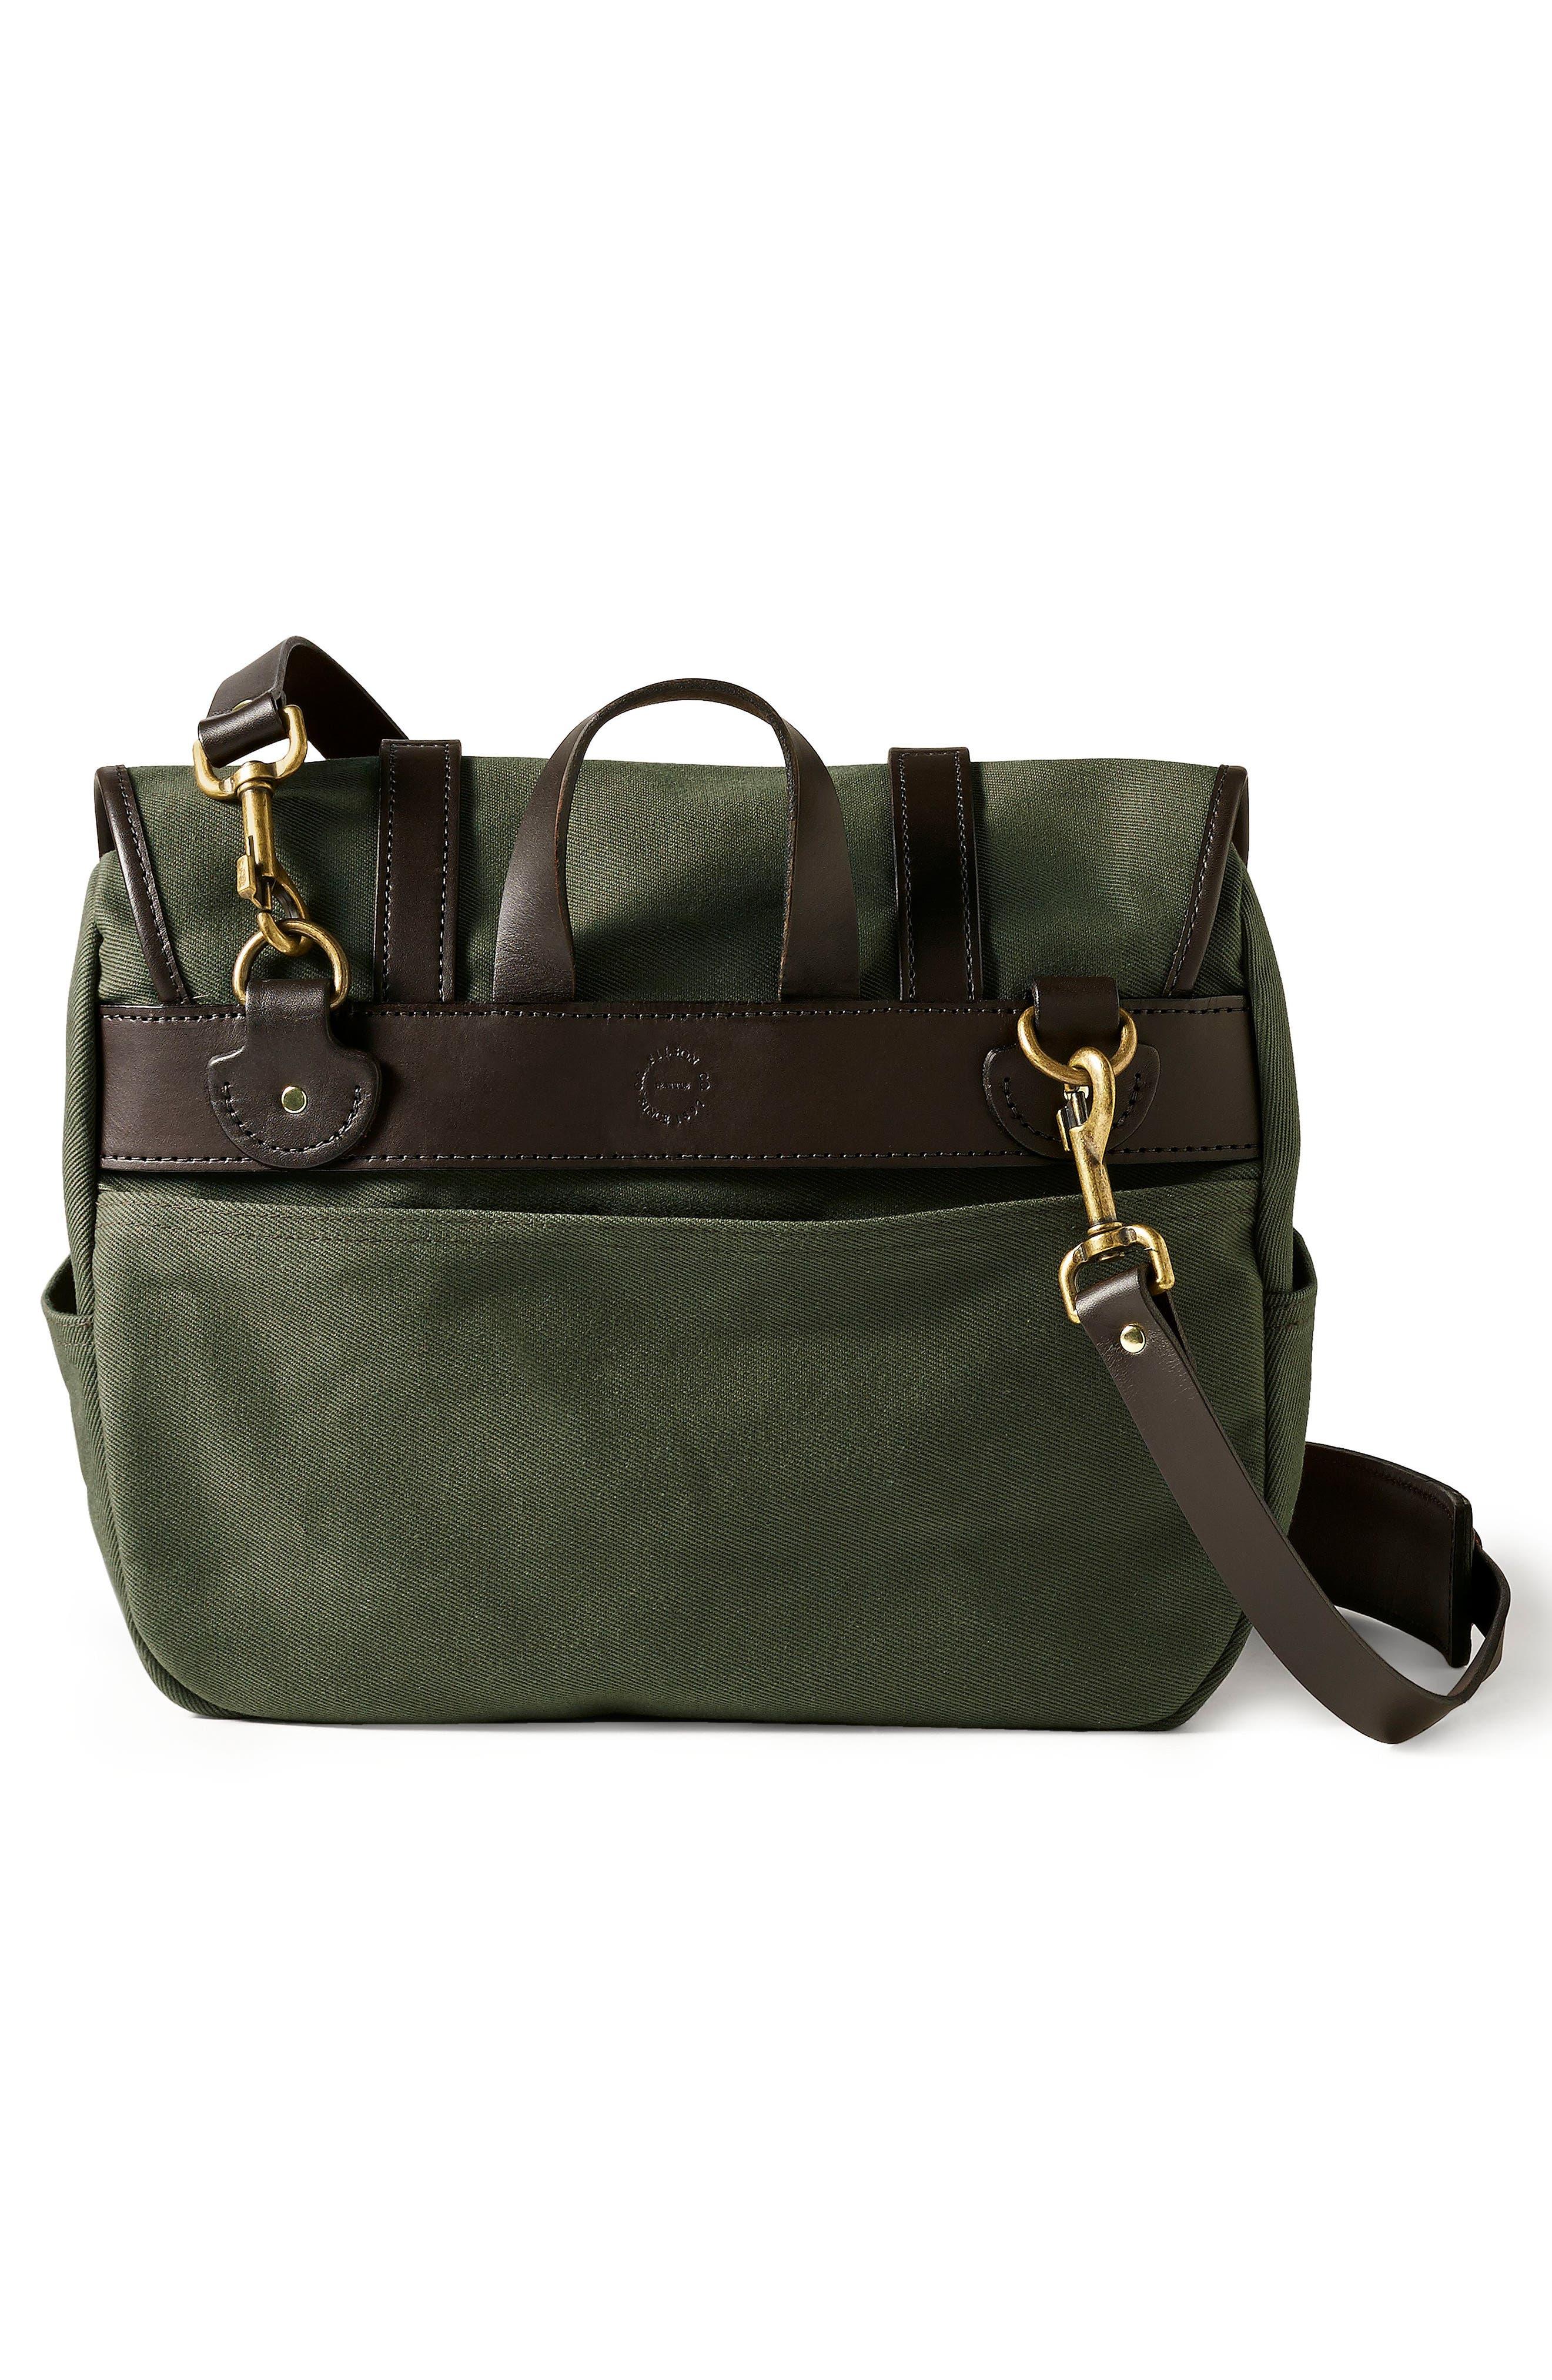 Medium Field Bag,                             Alternate thumbnail 2, color,                             Otter Green